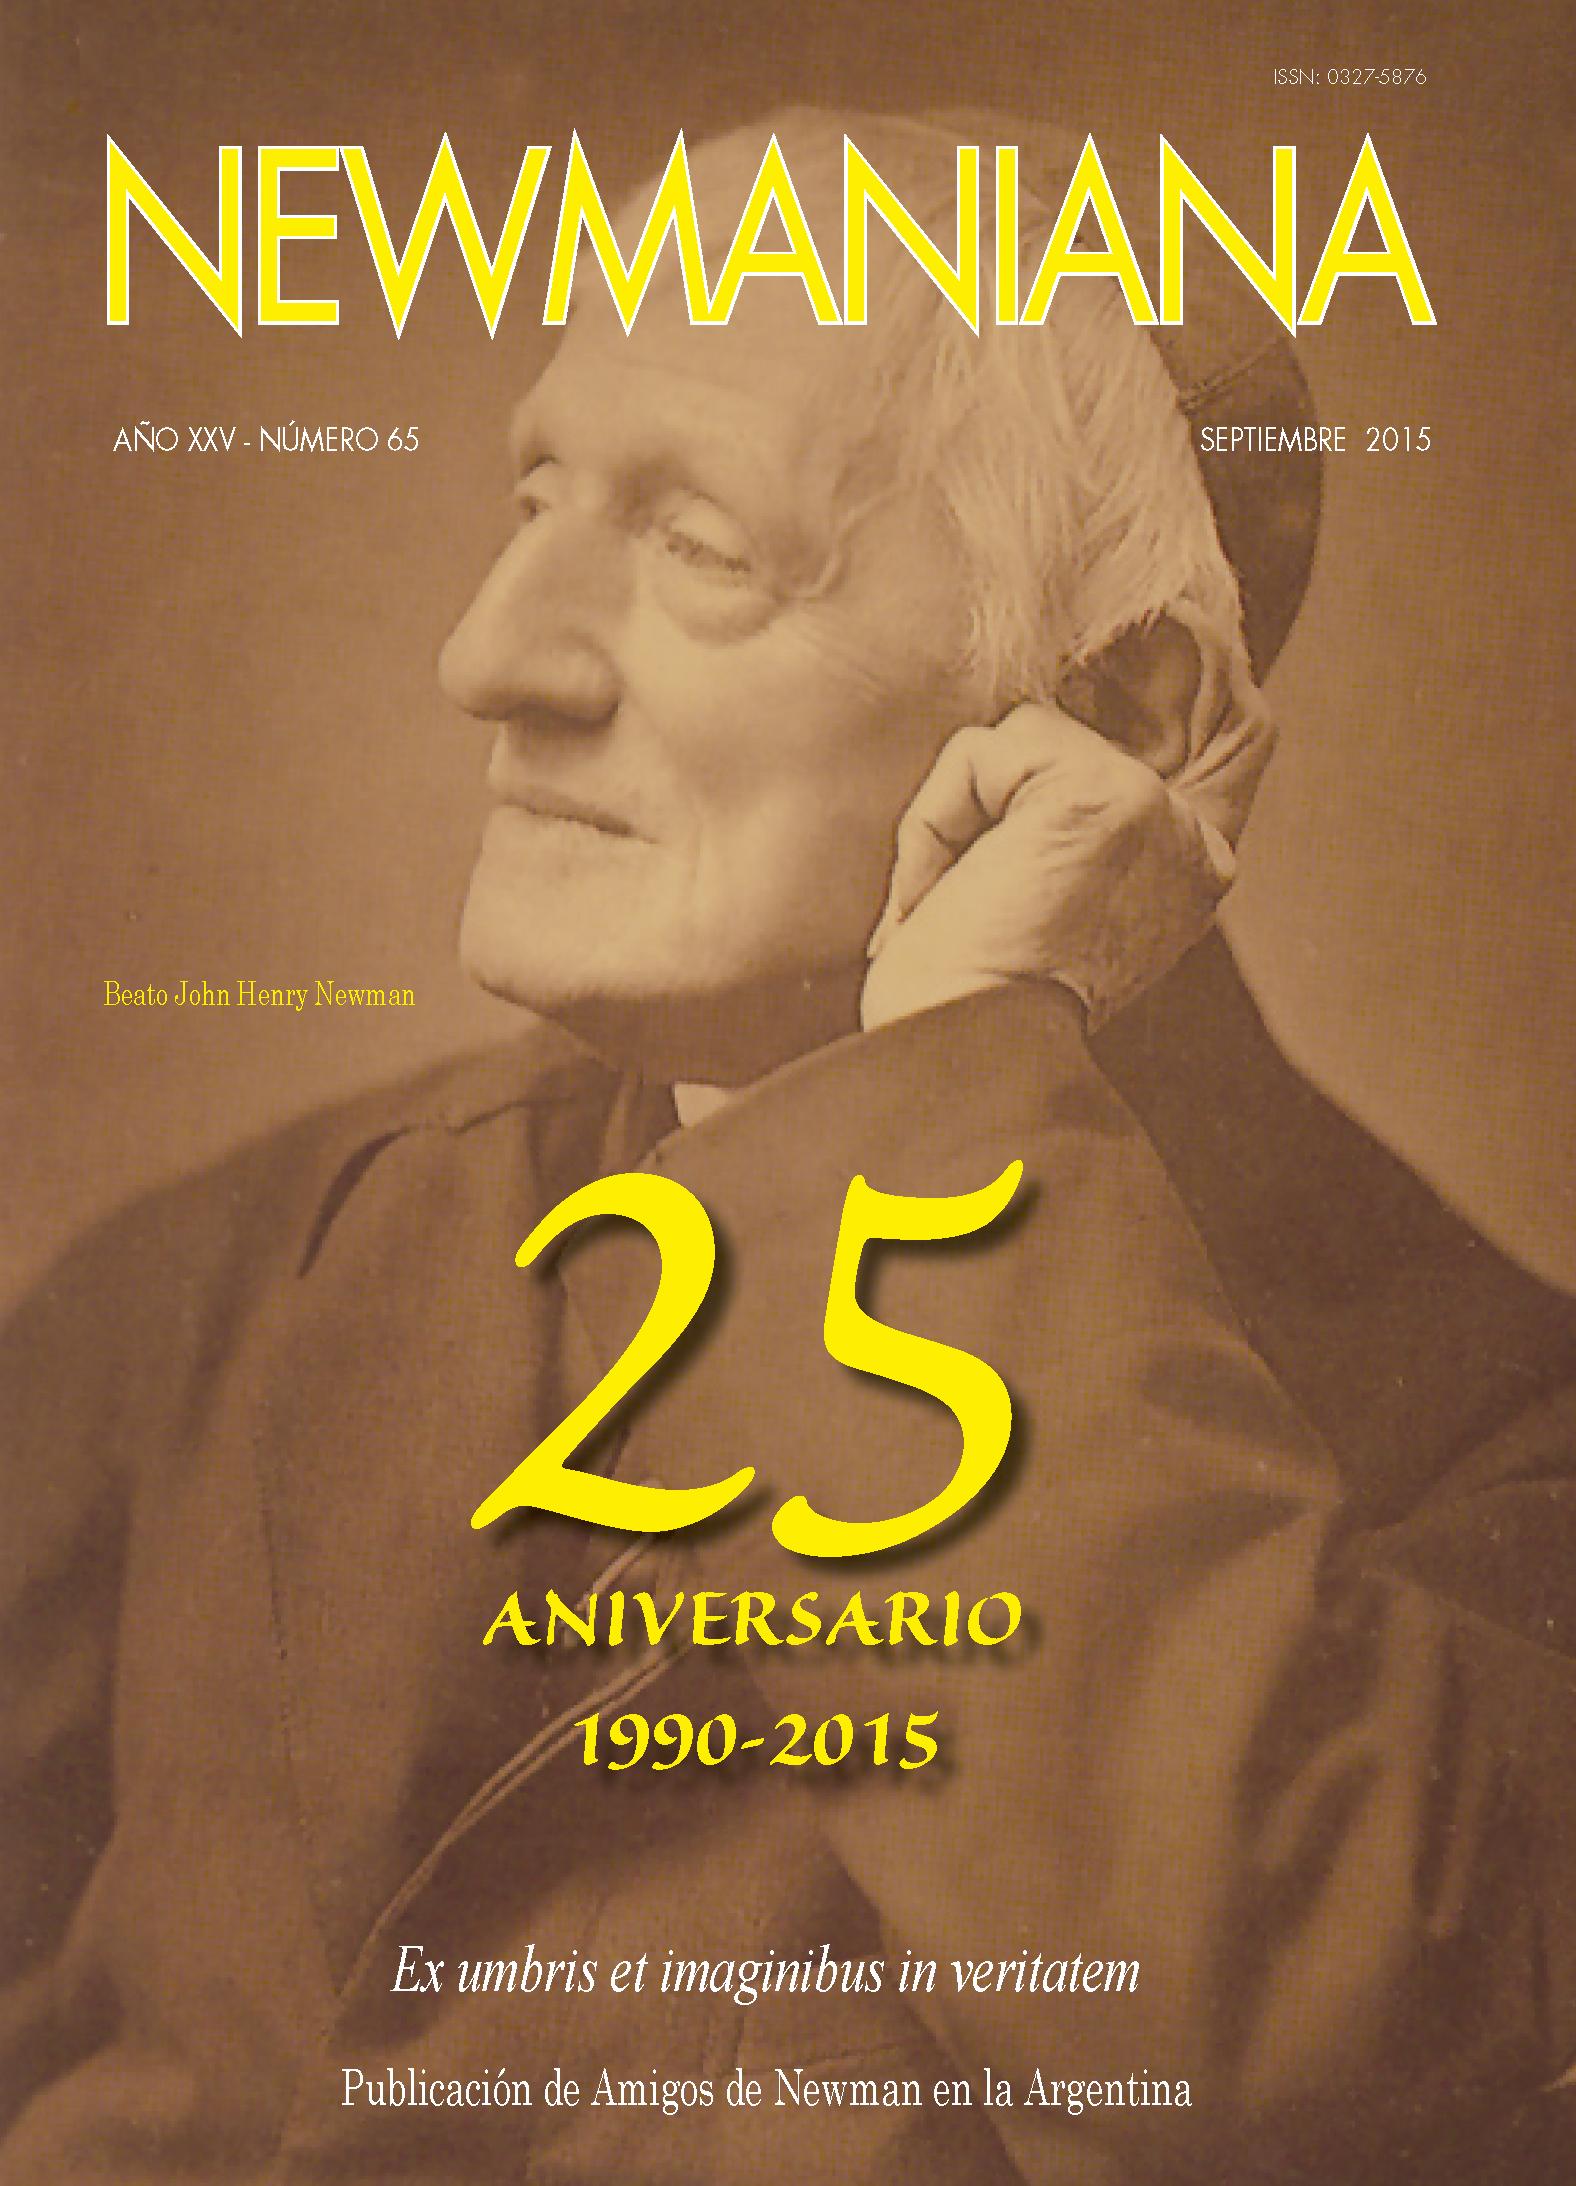 Revista Newmaniana N°65 – Septiembre 2015